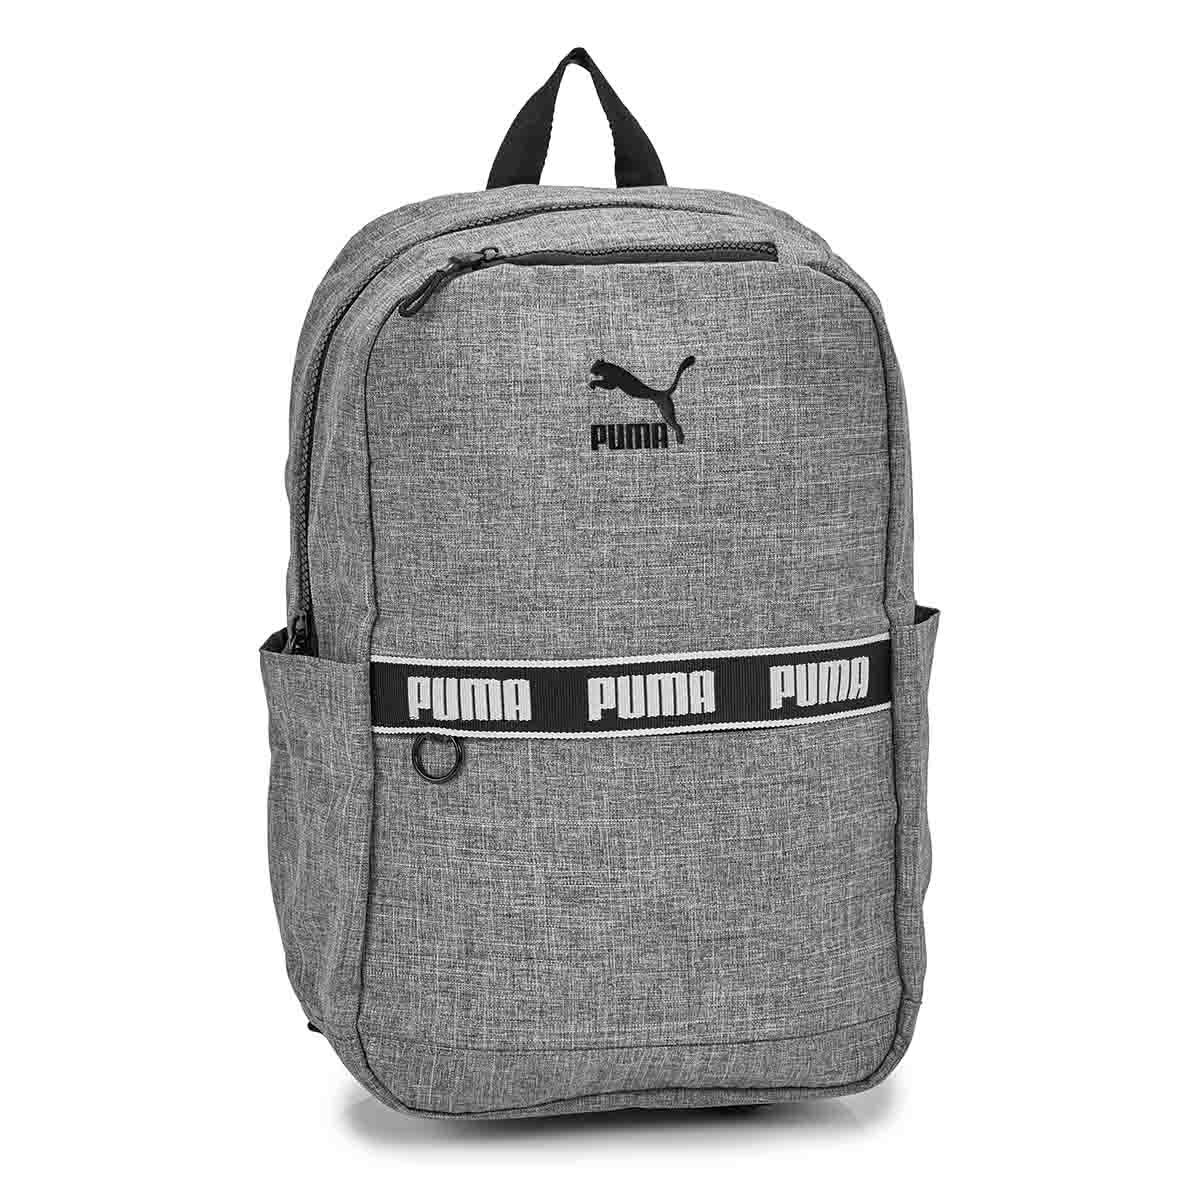 Unisex LINEAR grey backpack